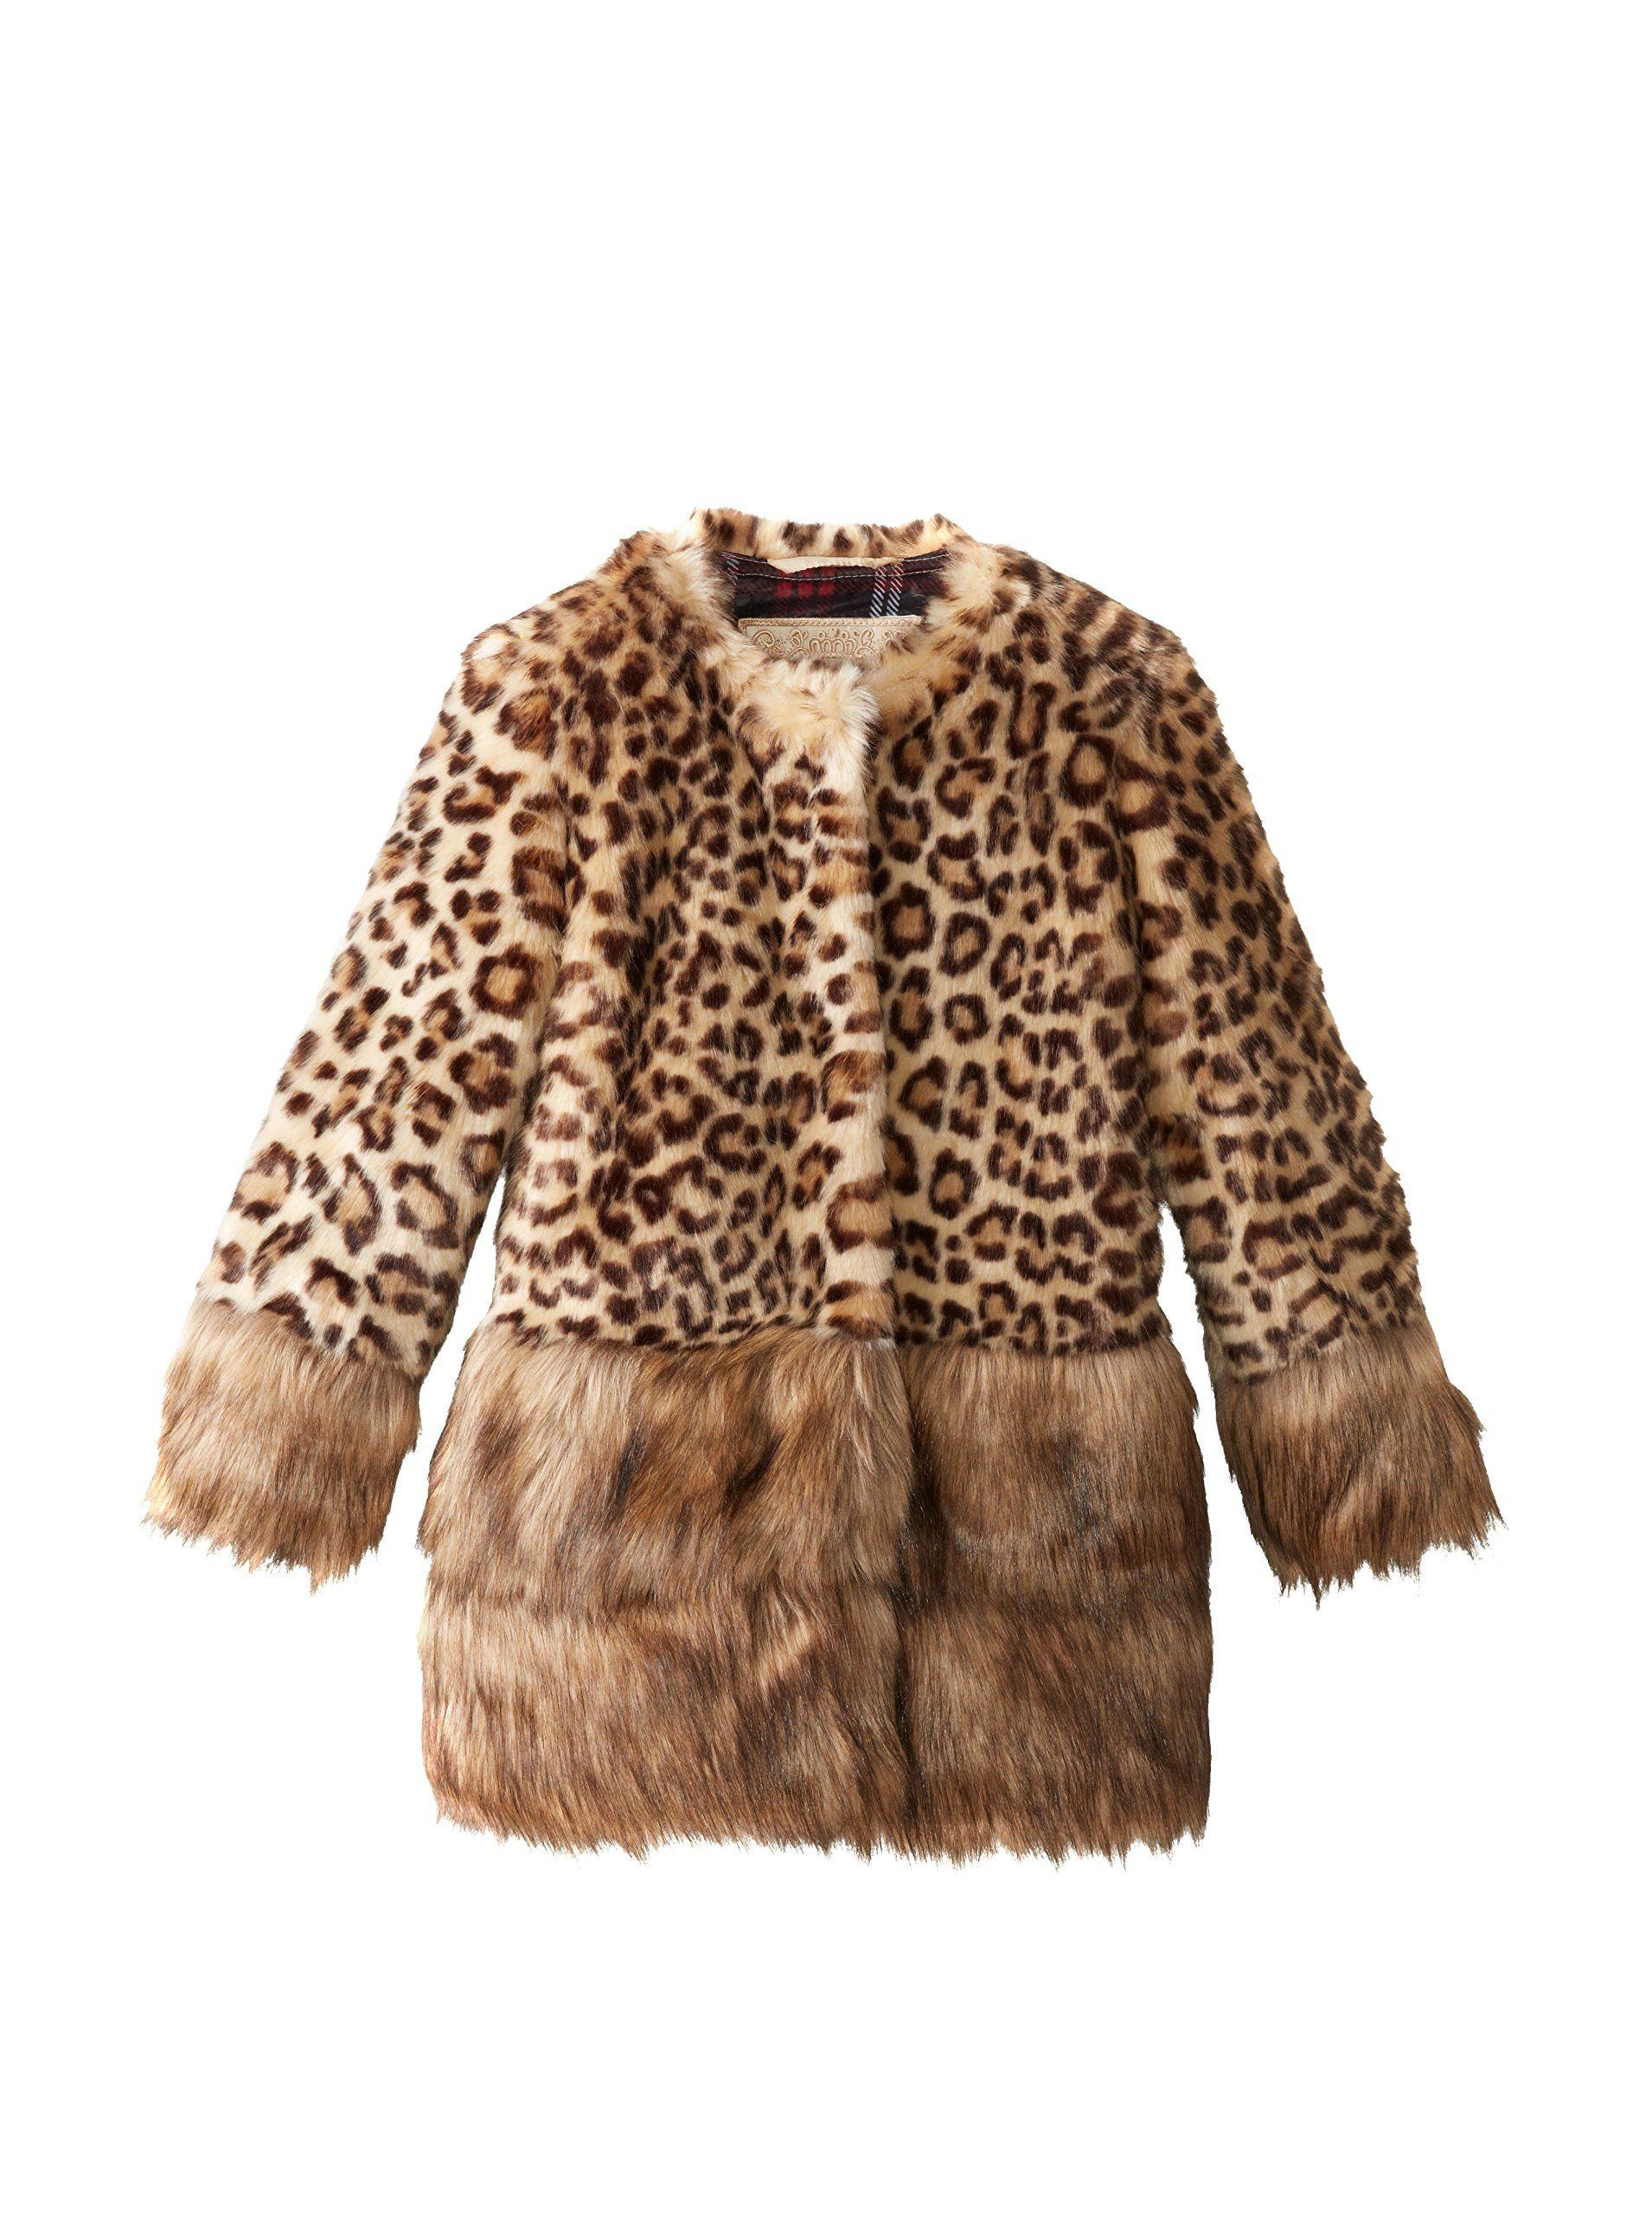 Monnalisa Kid's Faux Fur Coat at MYHABIT | All things